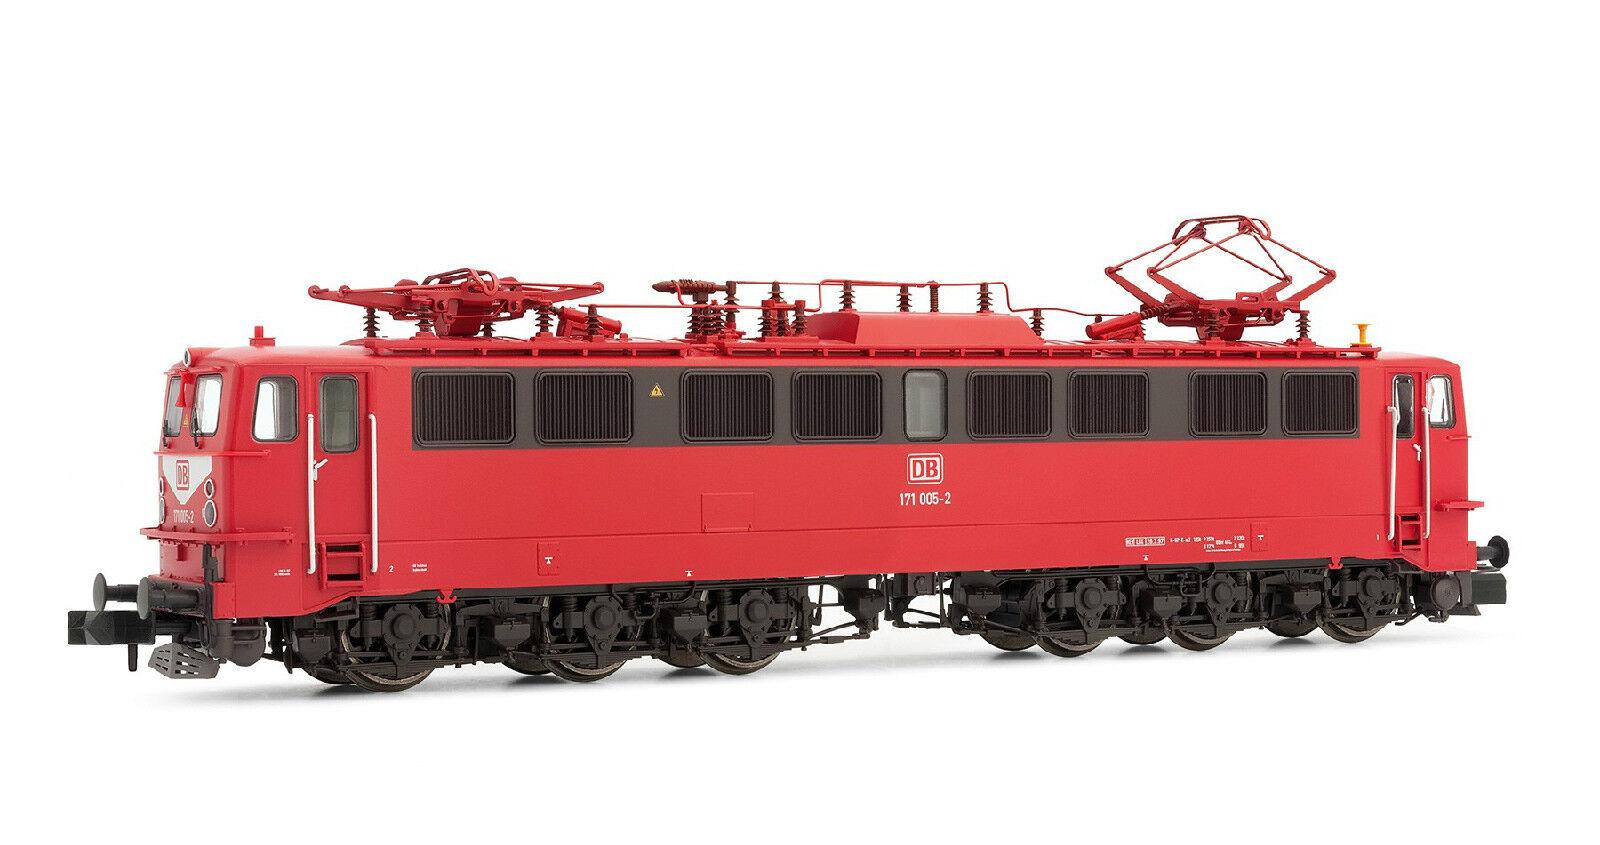 Arnold pista n  HN 2200 e-Lok, br 171 de la DB AG, 171 005-2, orientrosso-nuevo + embalaje original